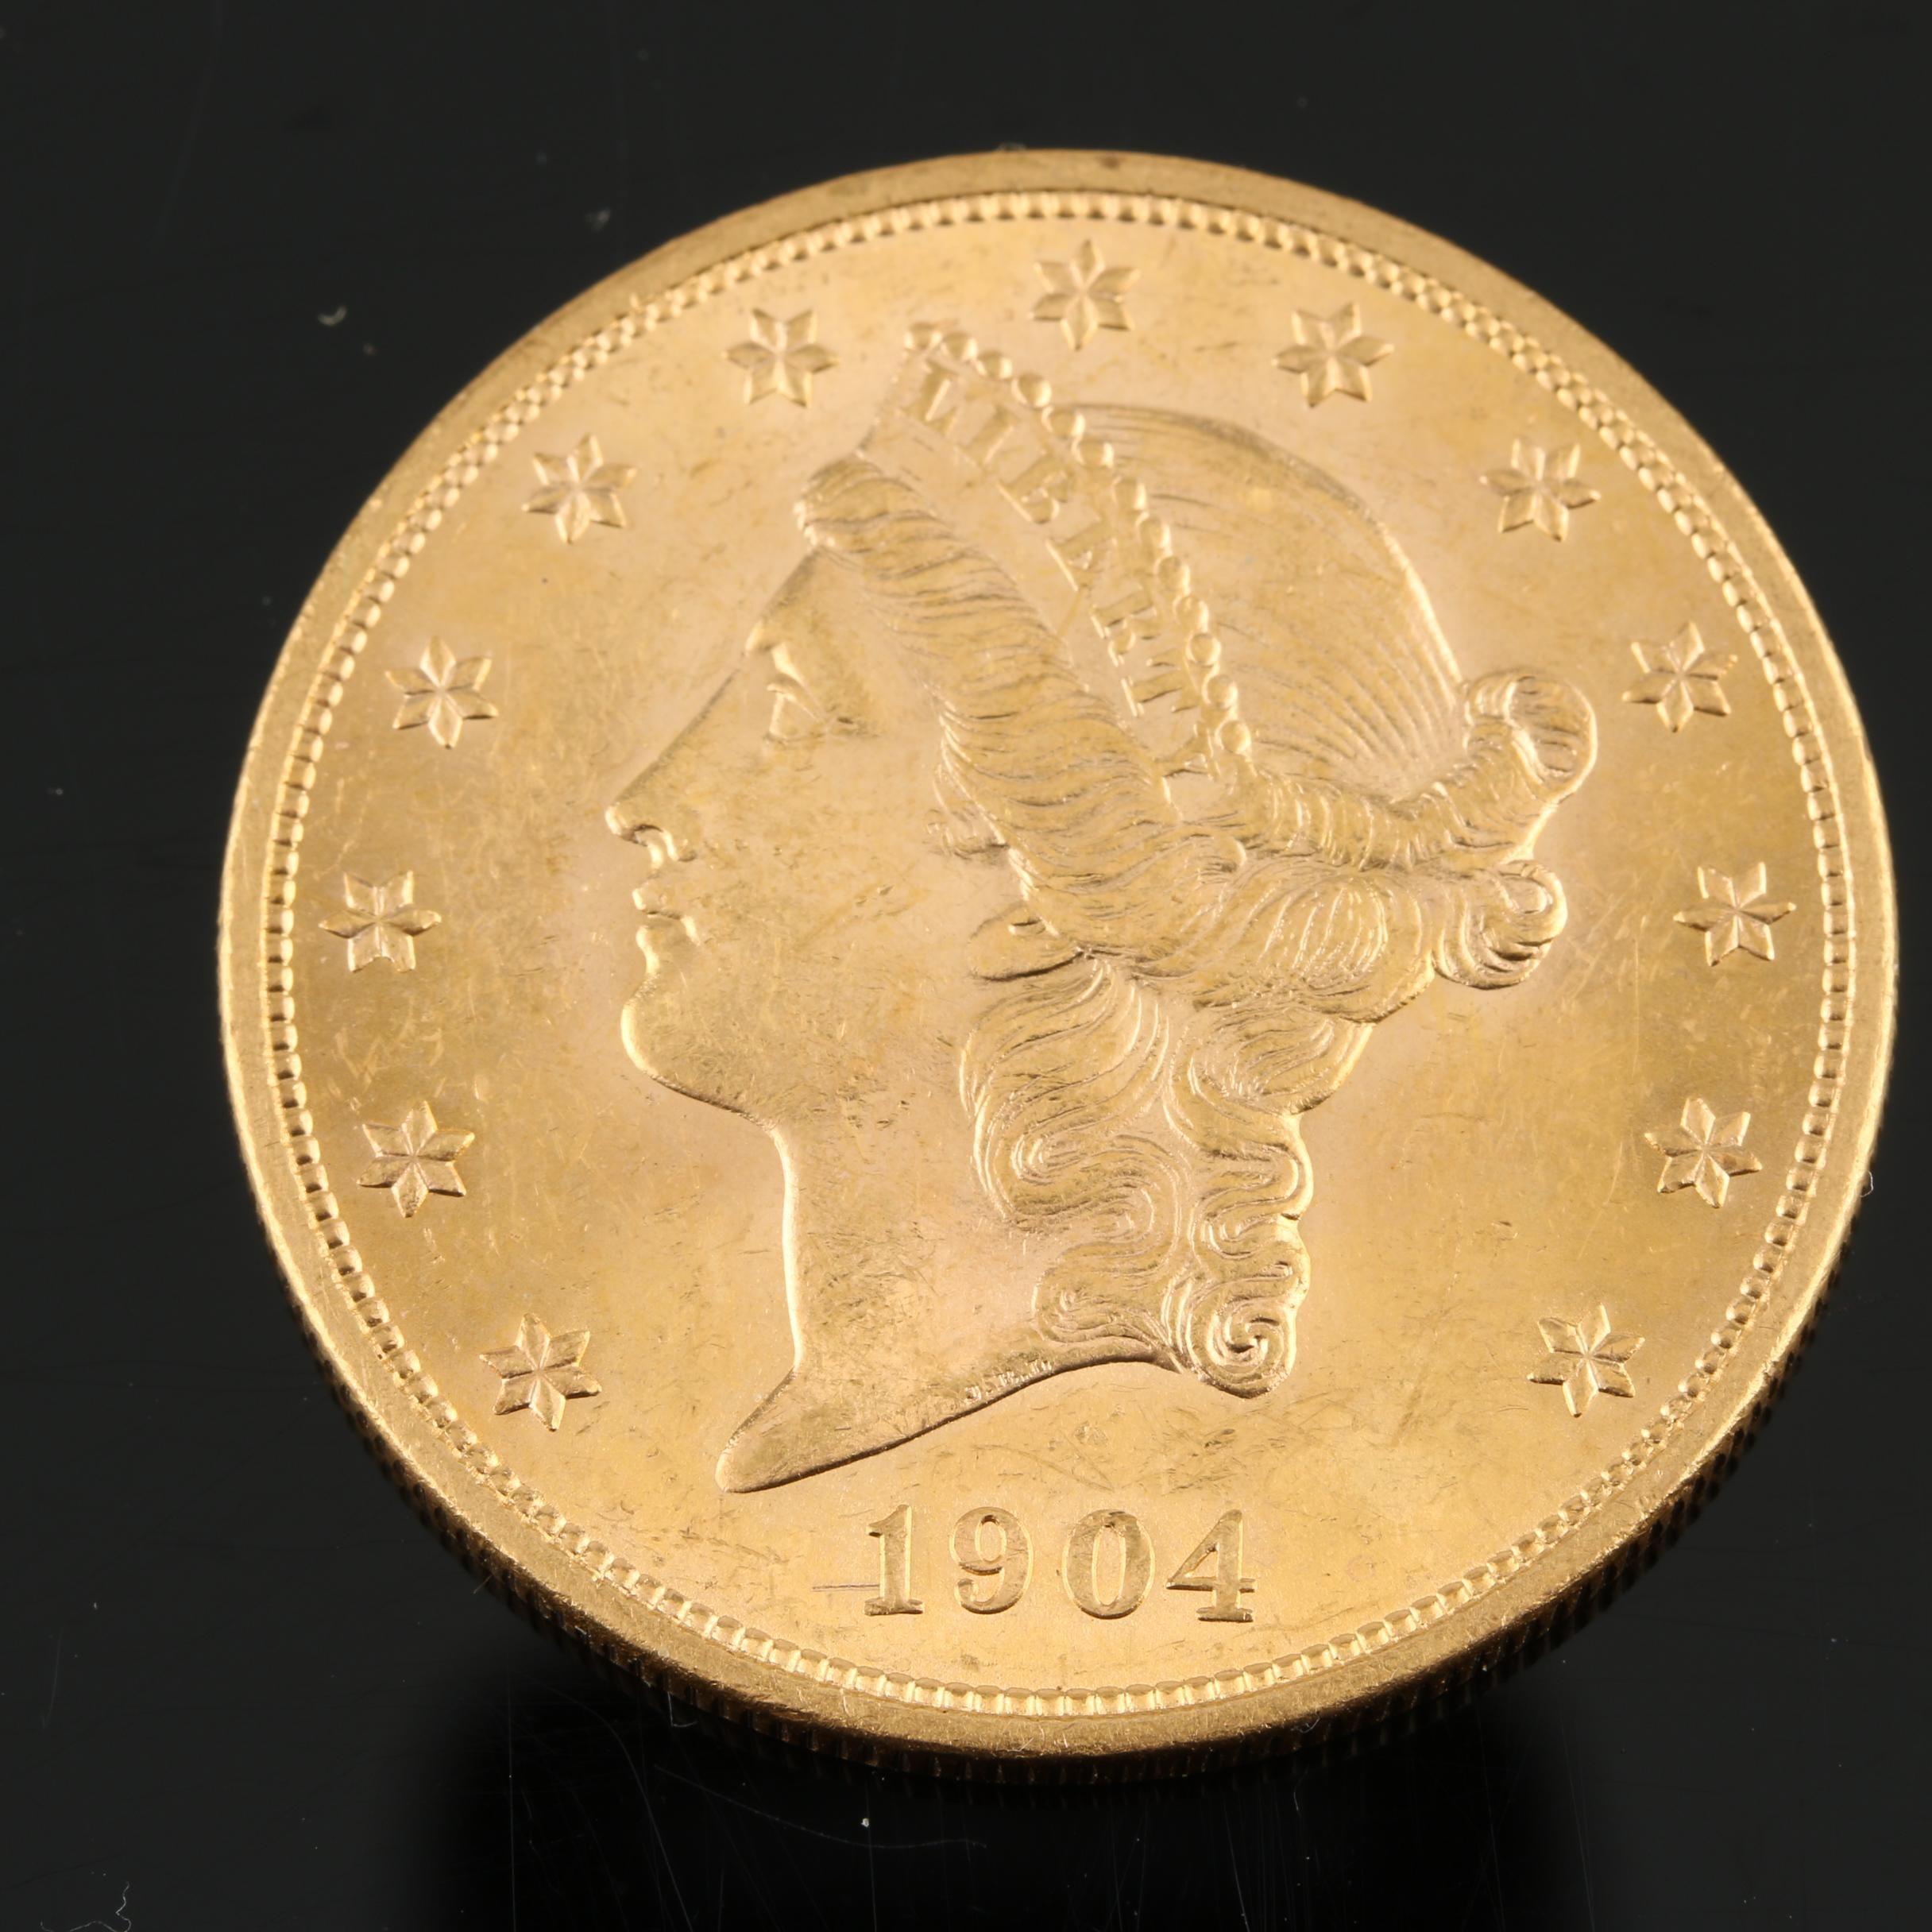 1904 Liberty Head $20 Gold Double Eagle